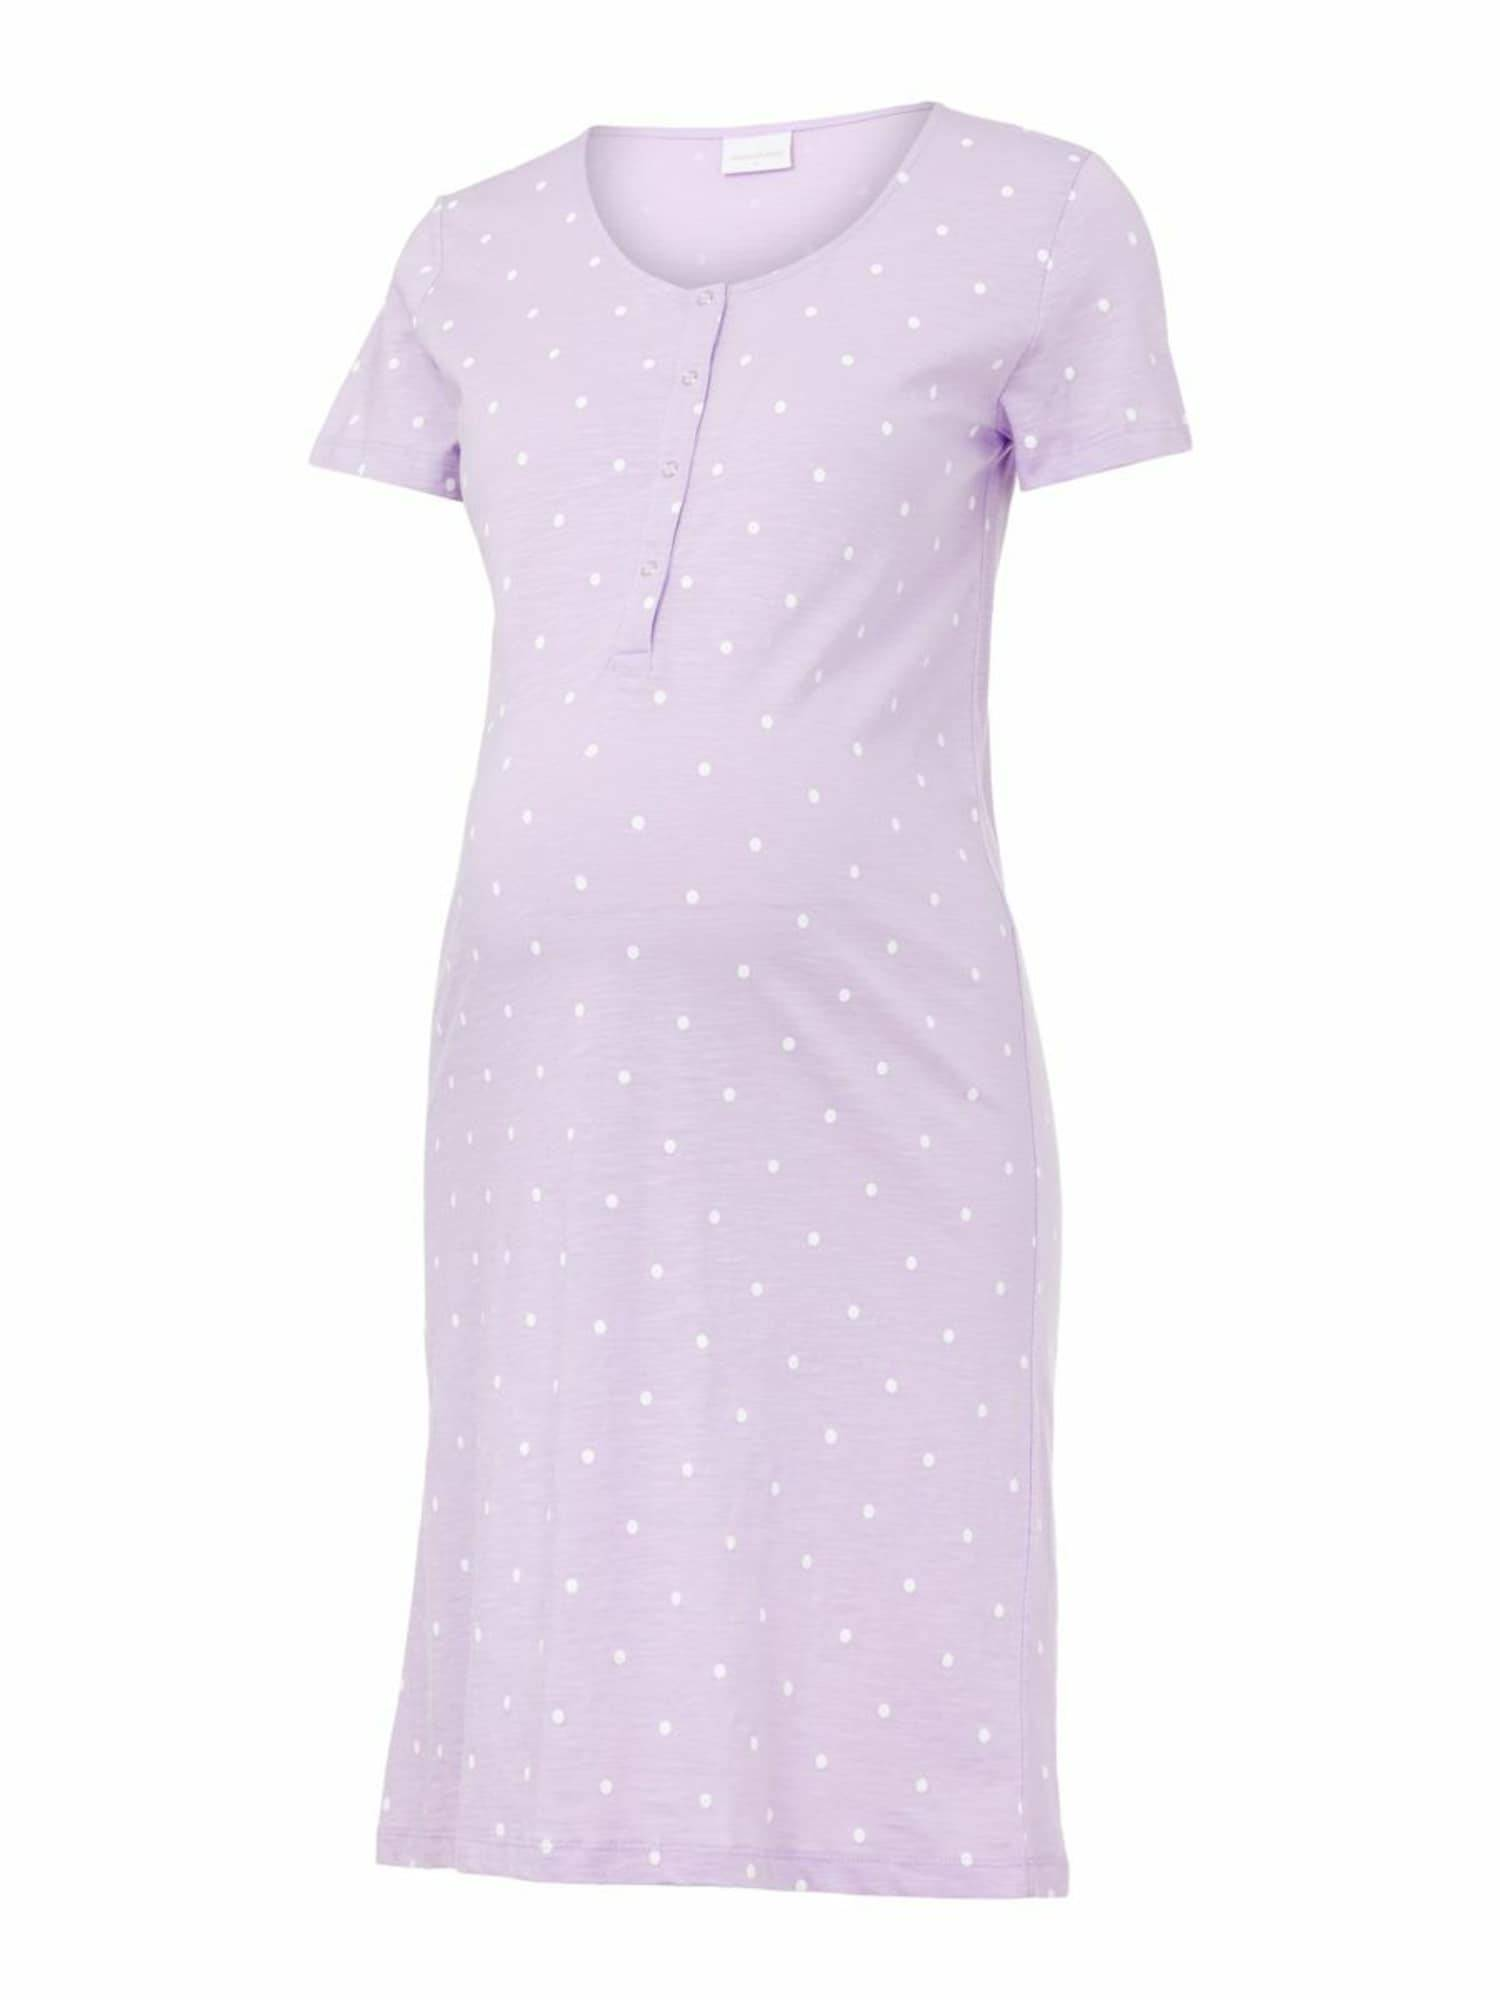 MAMALICIOUS Chemise de nuit 'Chill Lia'  - Violet - Taille: S - female